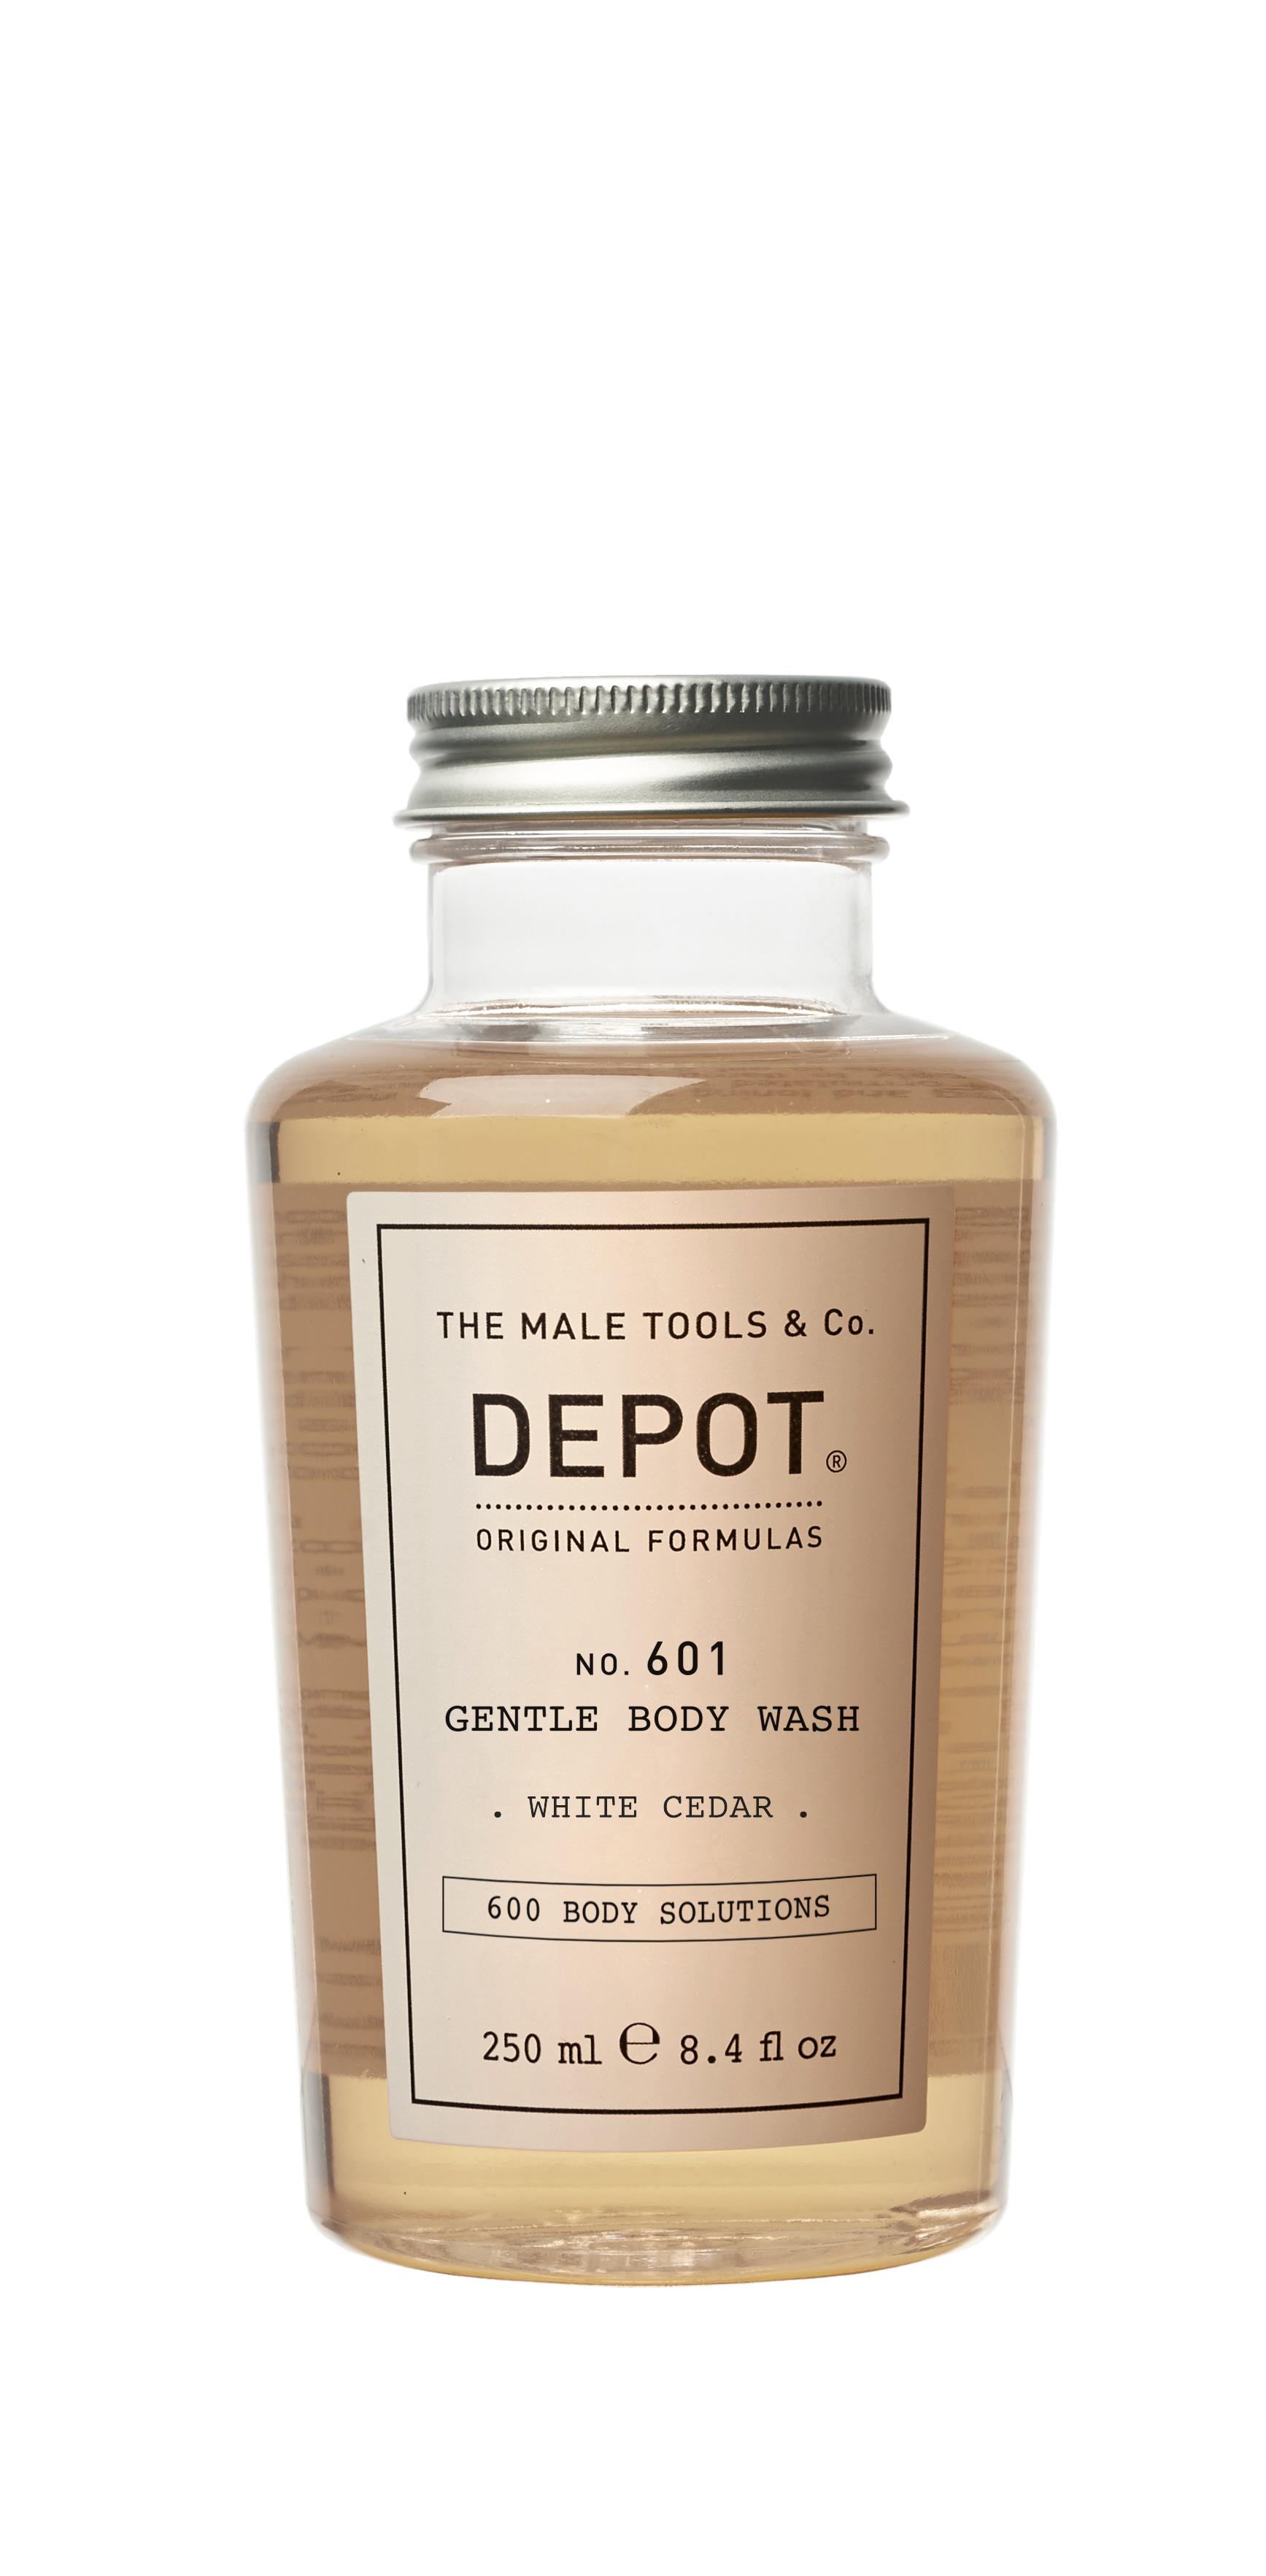 Depot - No. 601 Gentle Body Wash White Cedar - 250 ml